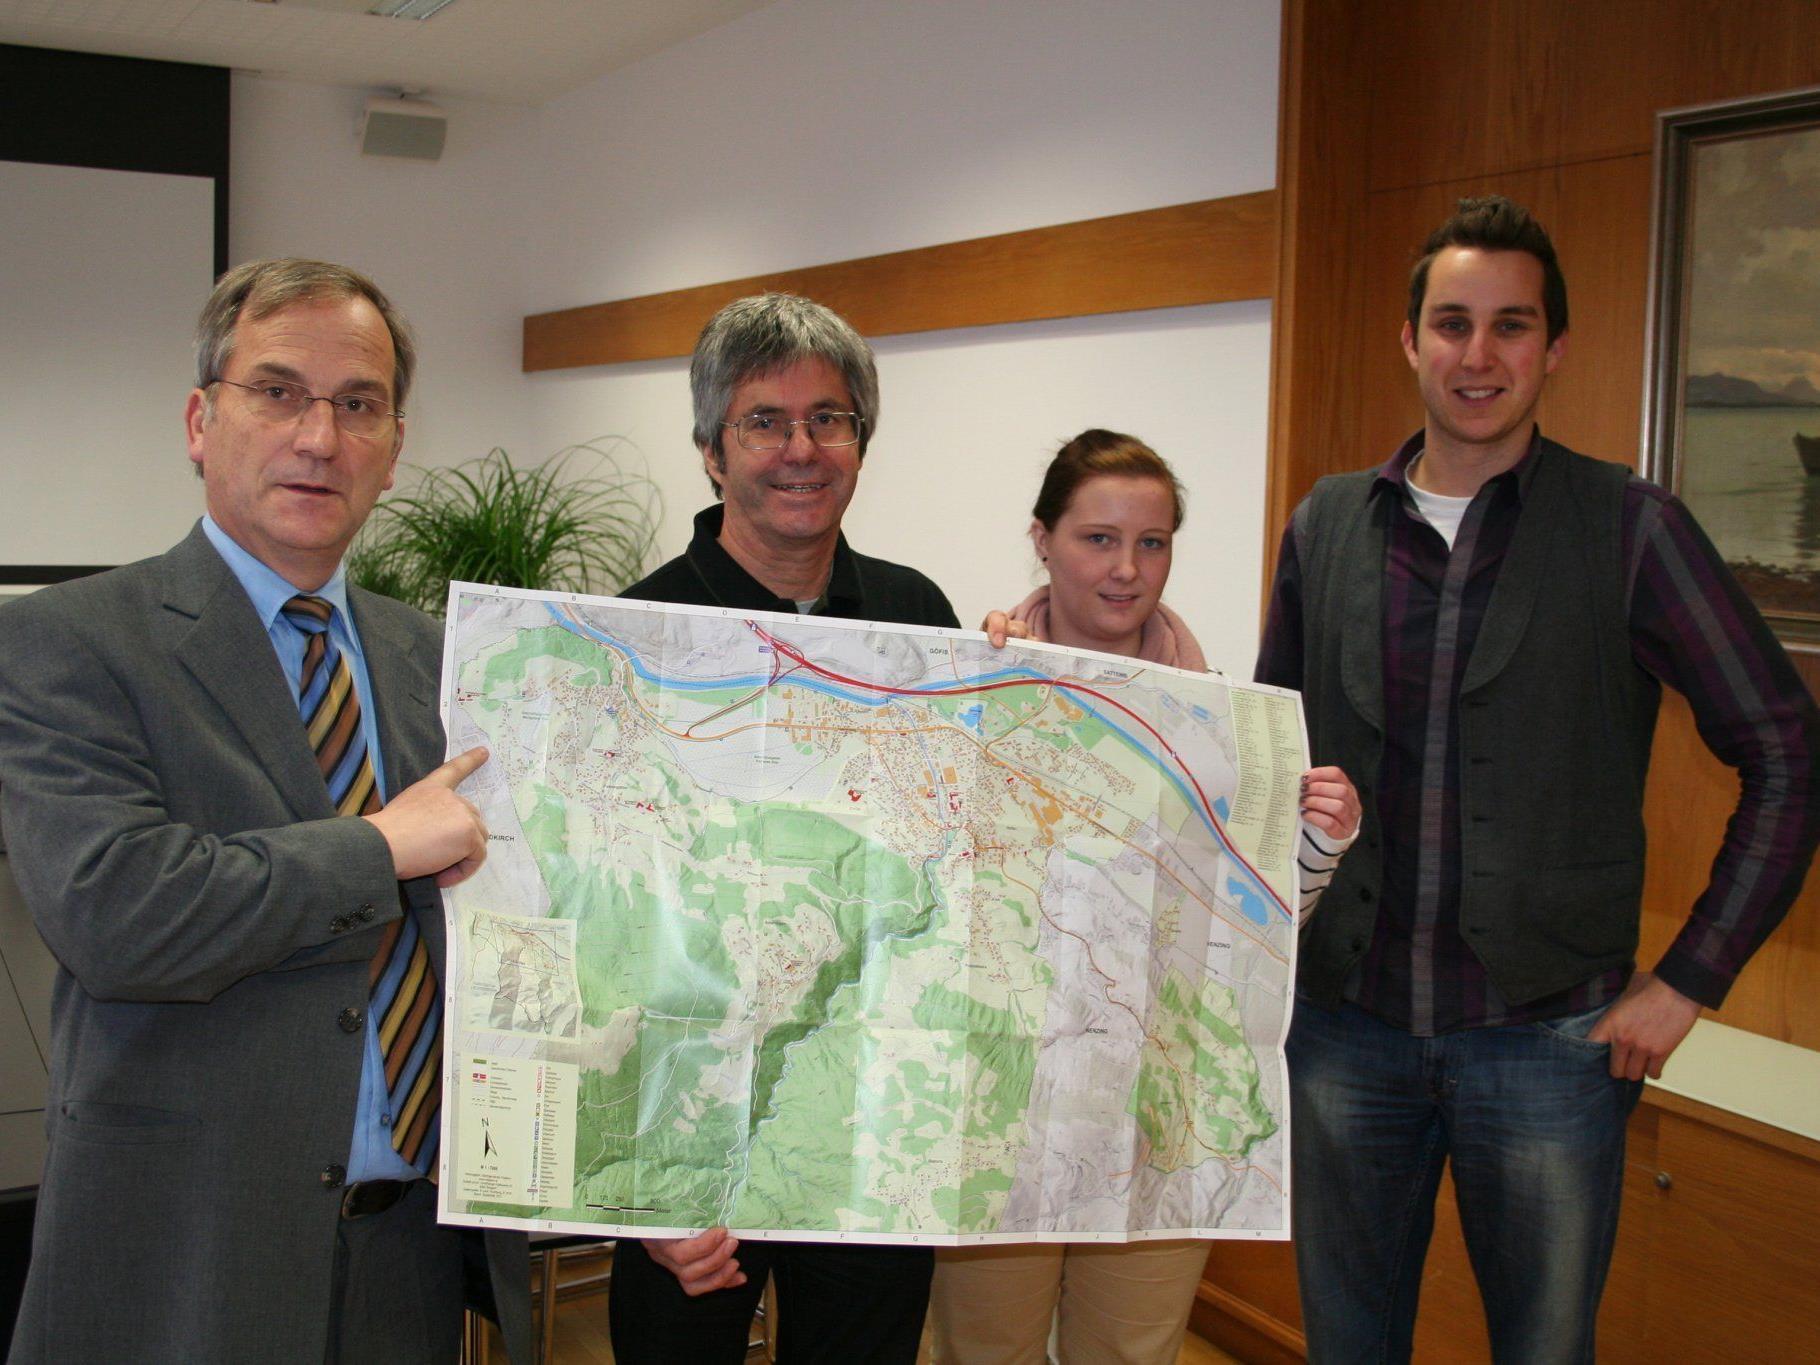 Bürgermeister Eugen Gabriel, Martin Tiefenthaler, Sabine Erath, Christian Neyer.